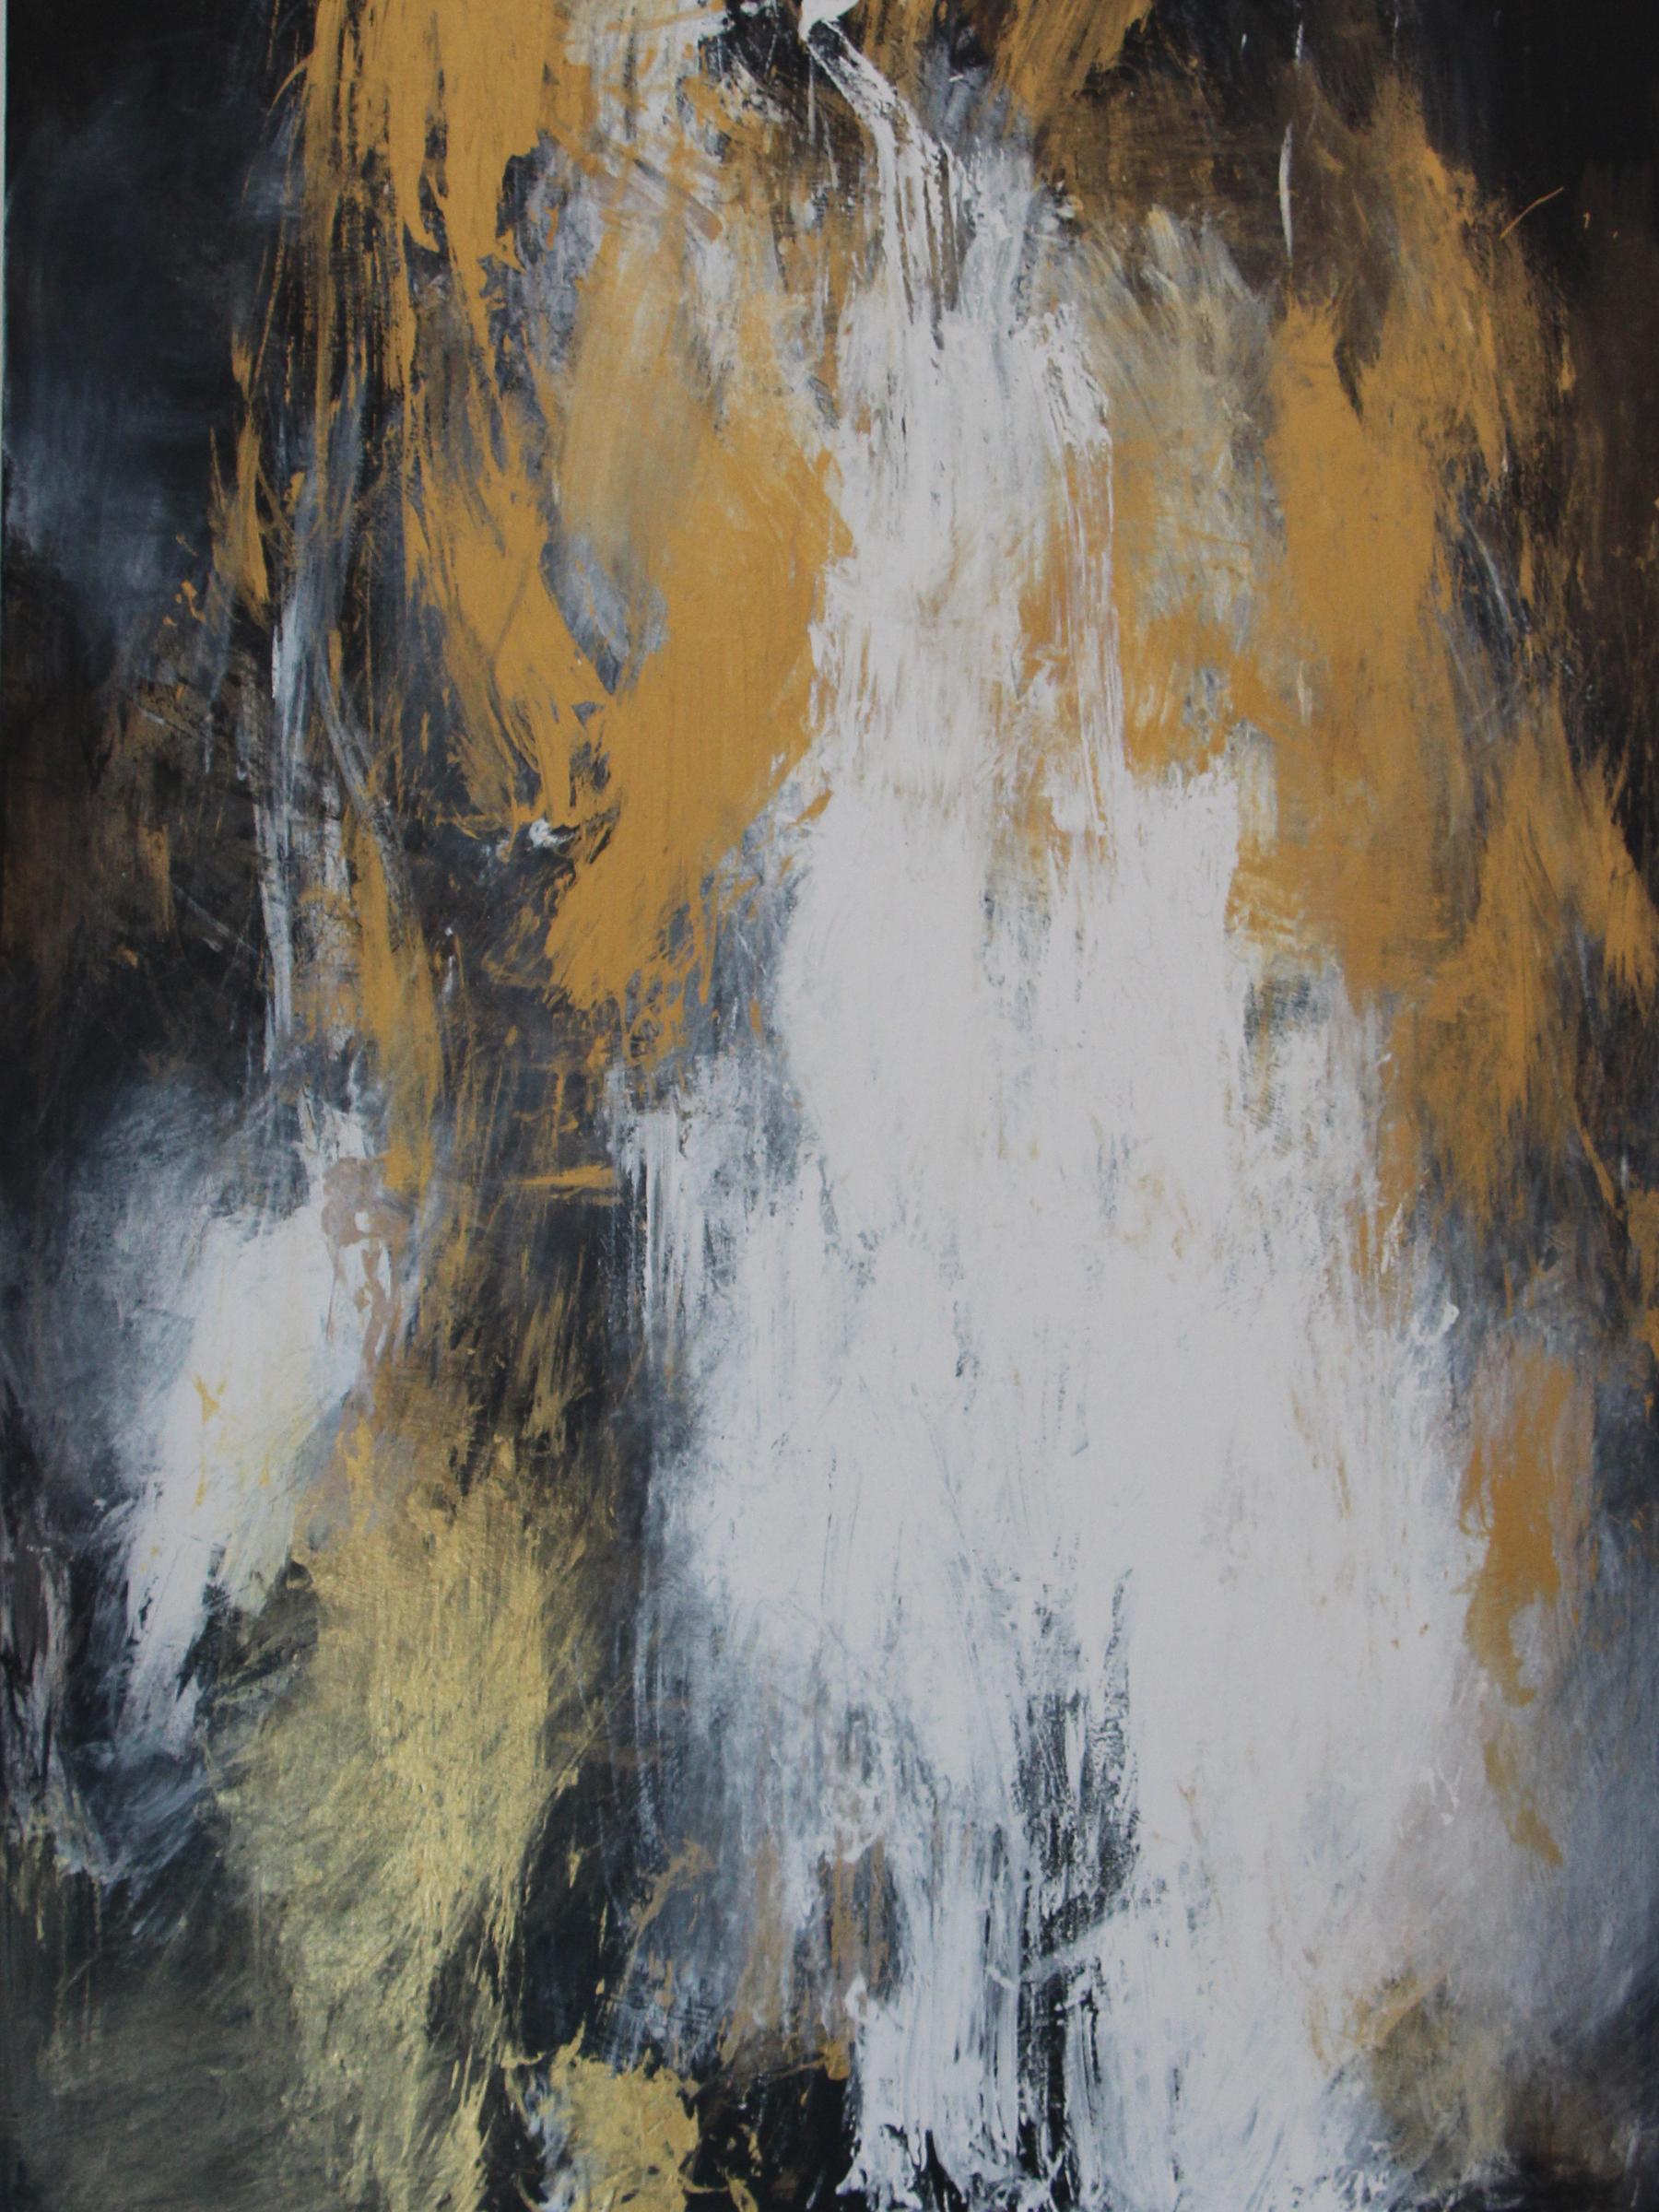 Acrylic and metallic paint on canvas 36 X 48 Buy $500 Rent per week $150